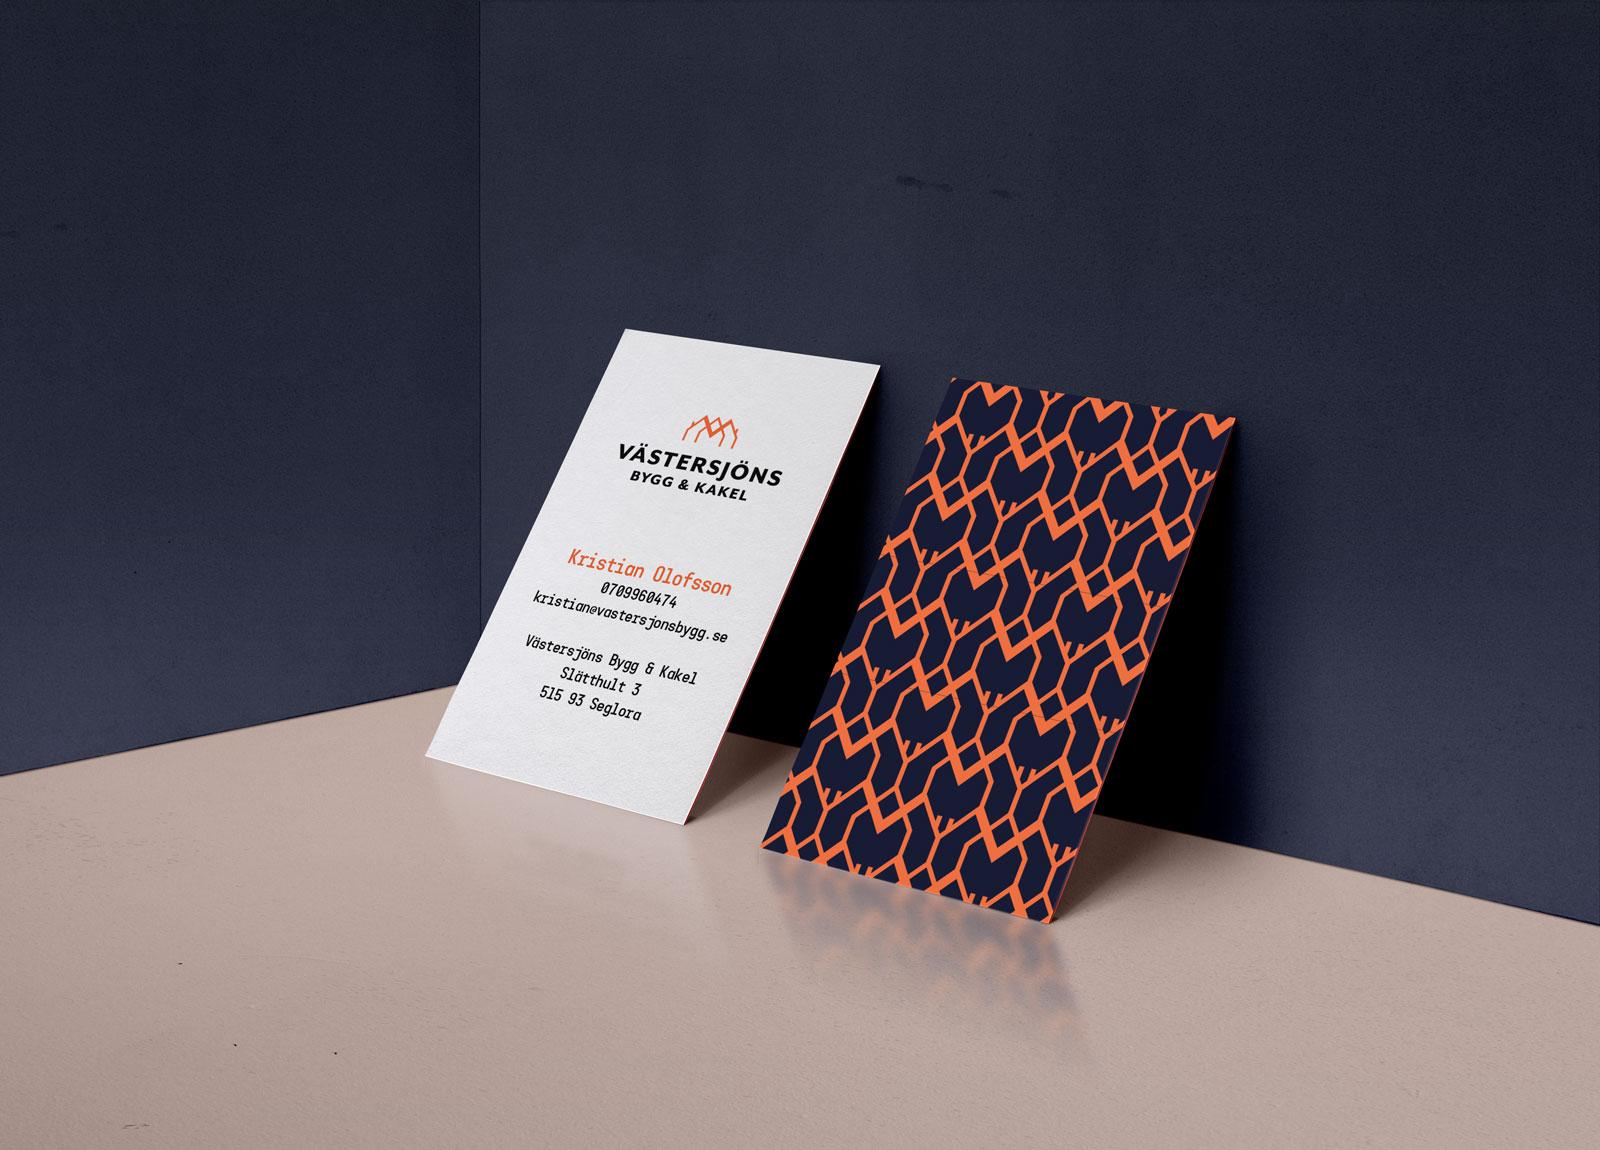 vastersjons_bygg_och_kakel-logo-Mia_Olofsson_business-card